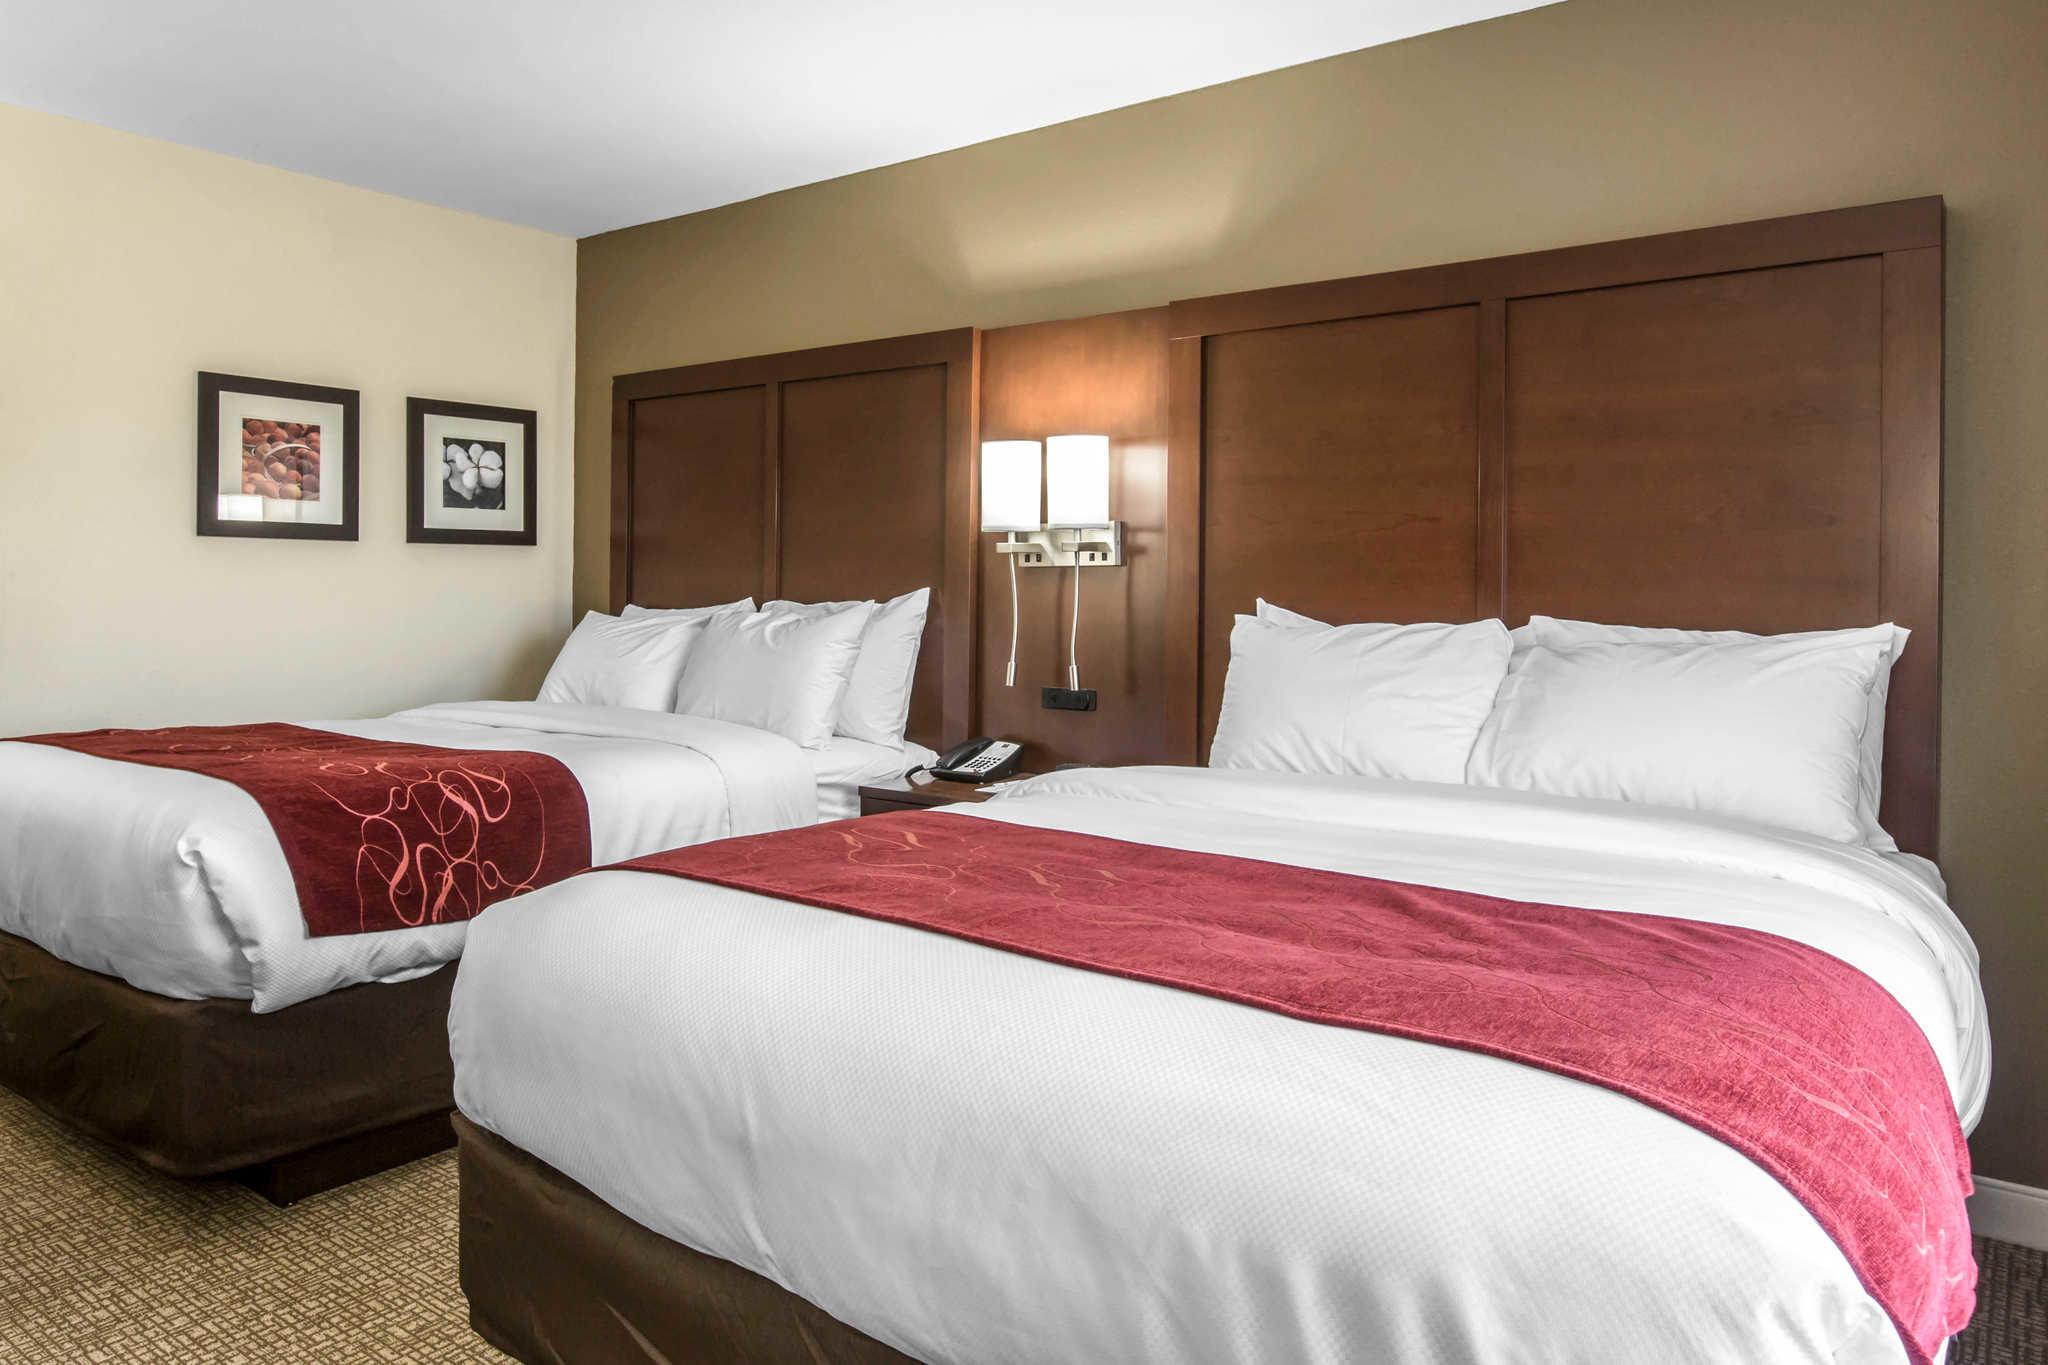 Comfort Inn & Suites West image 17